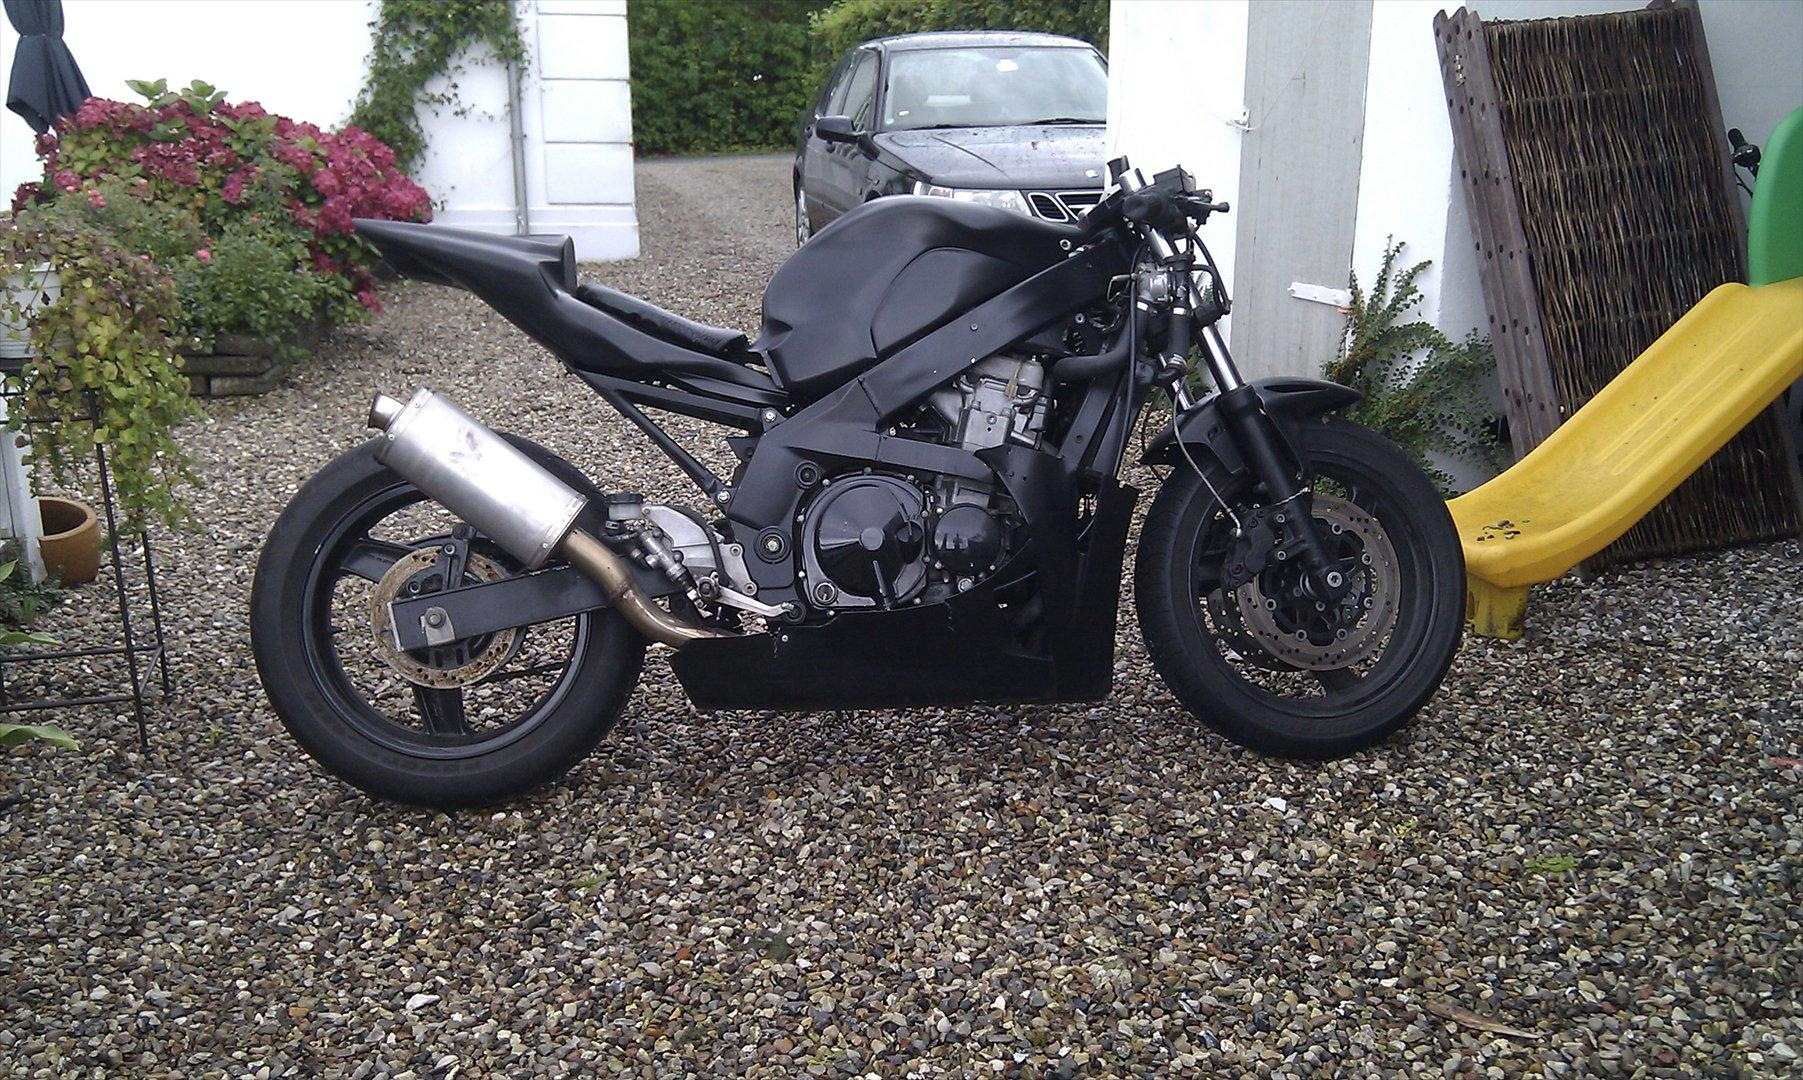 Kawasaki Zzr 600 Streetfighter 1991 Motorcykel Er Under Download Image 1803 X 1080